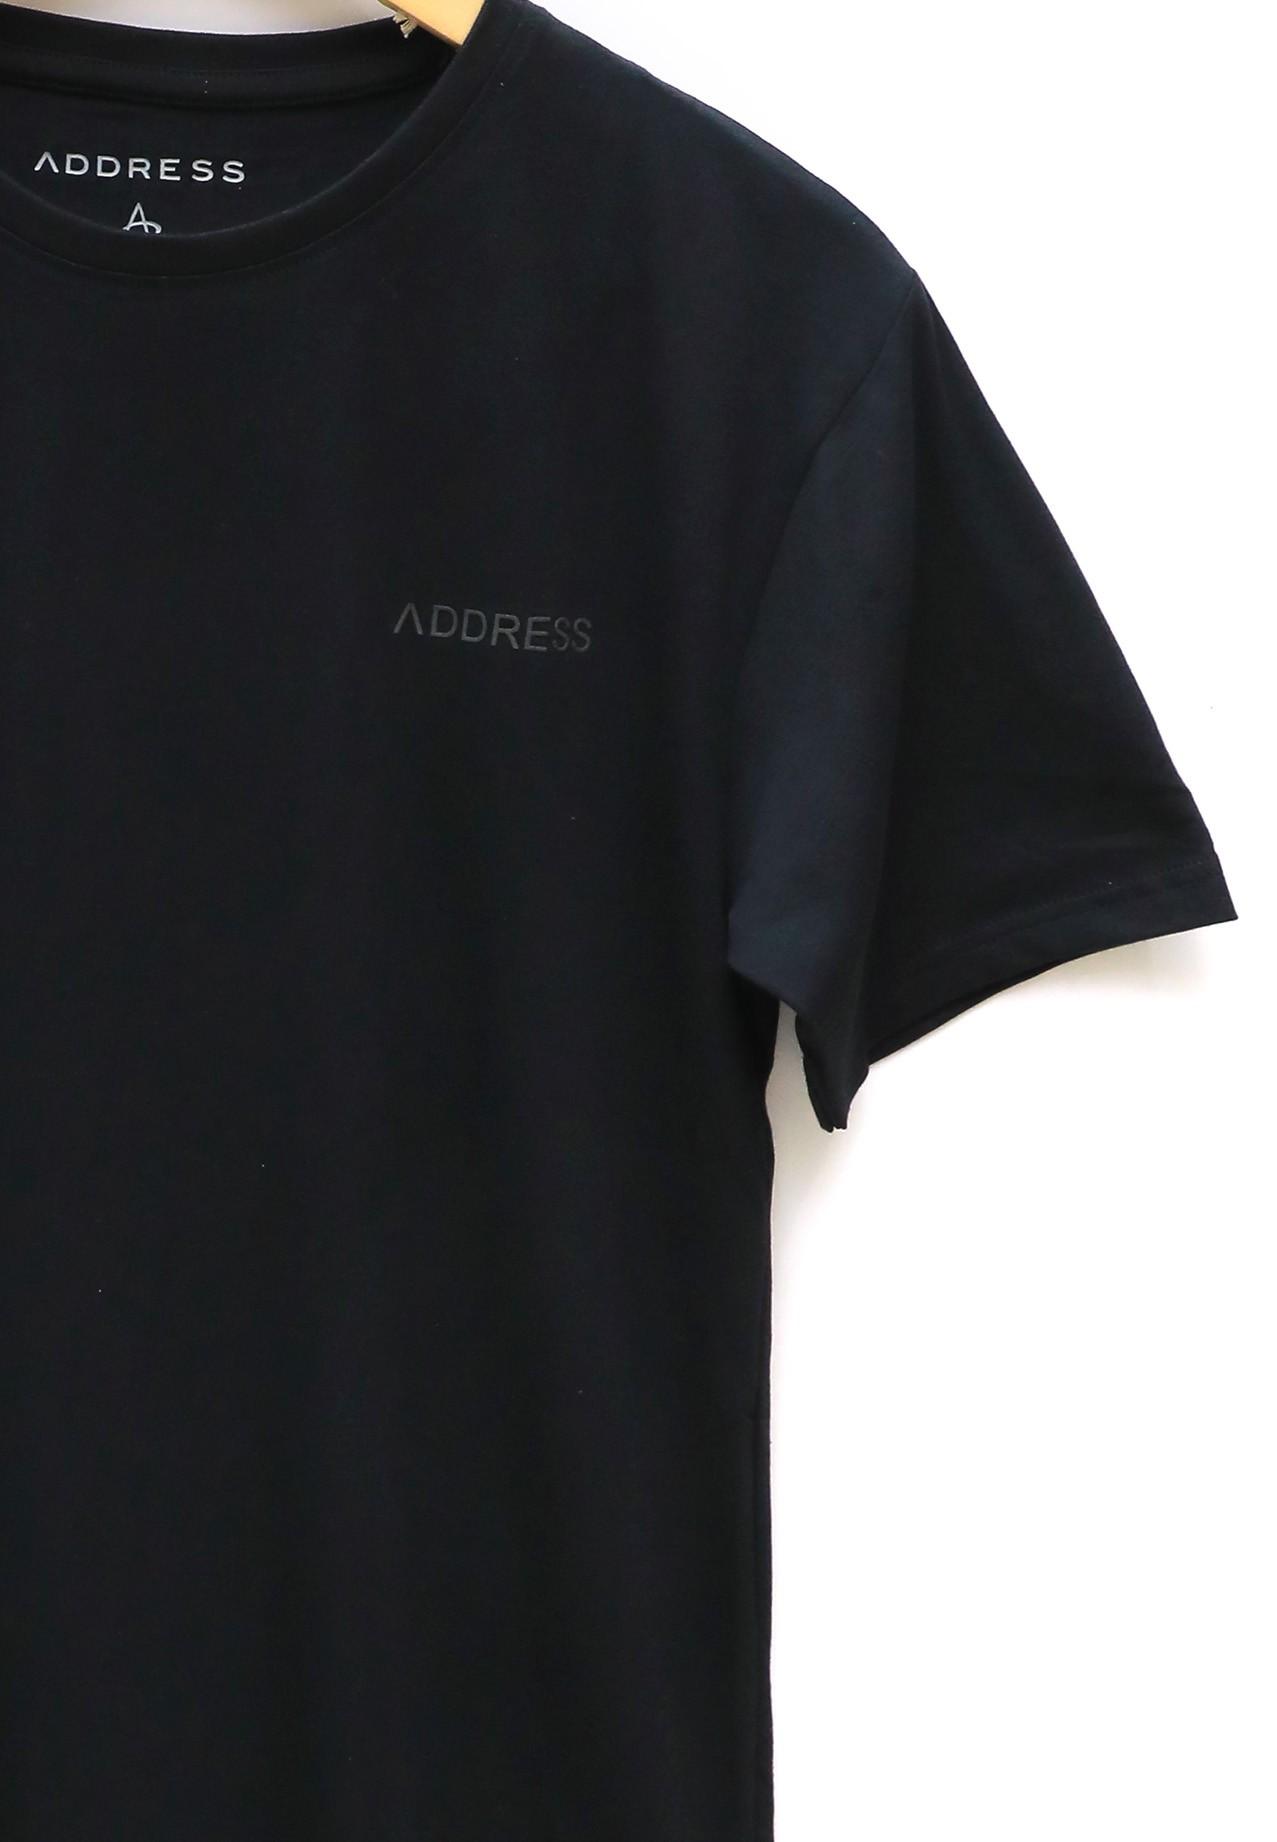 Address Black Plain T-Shirt Round Neck, Large